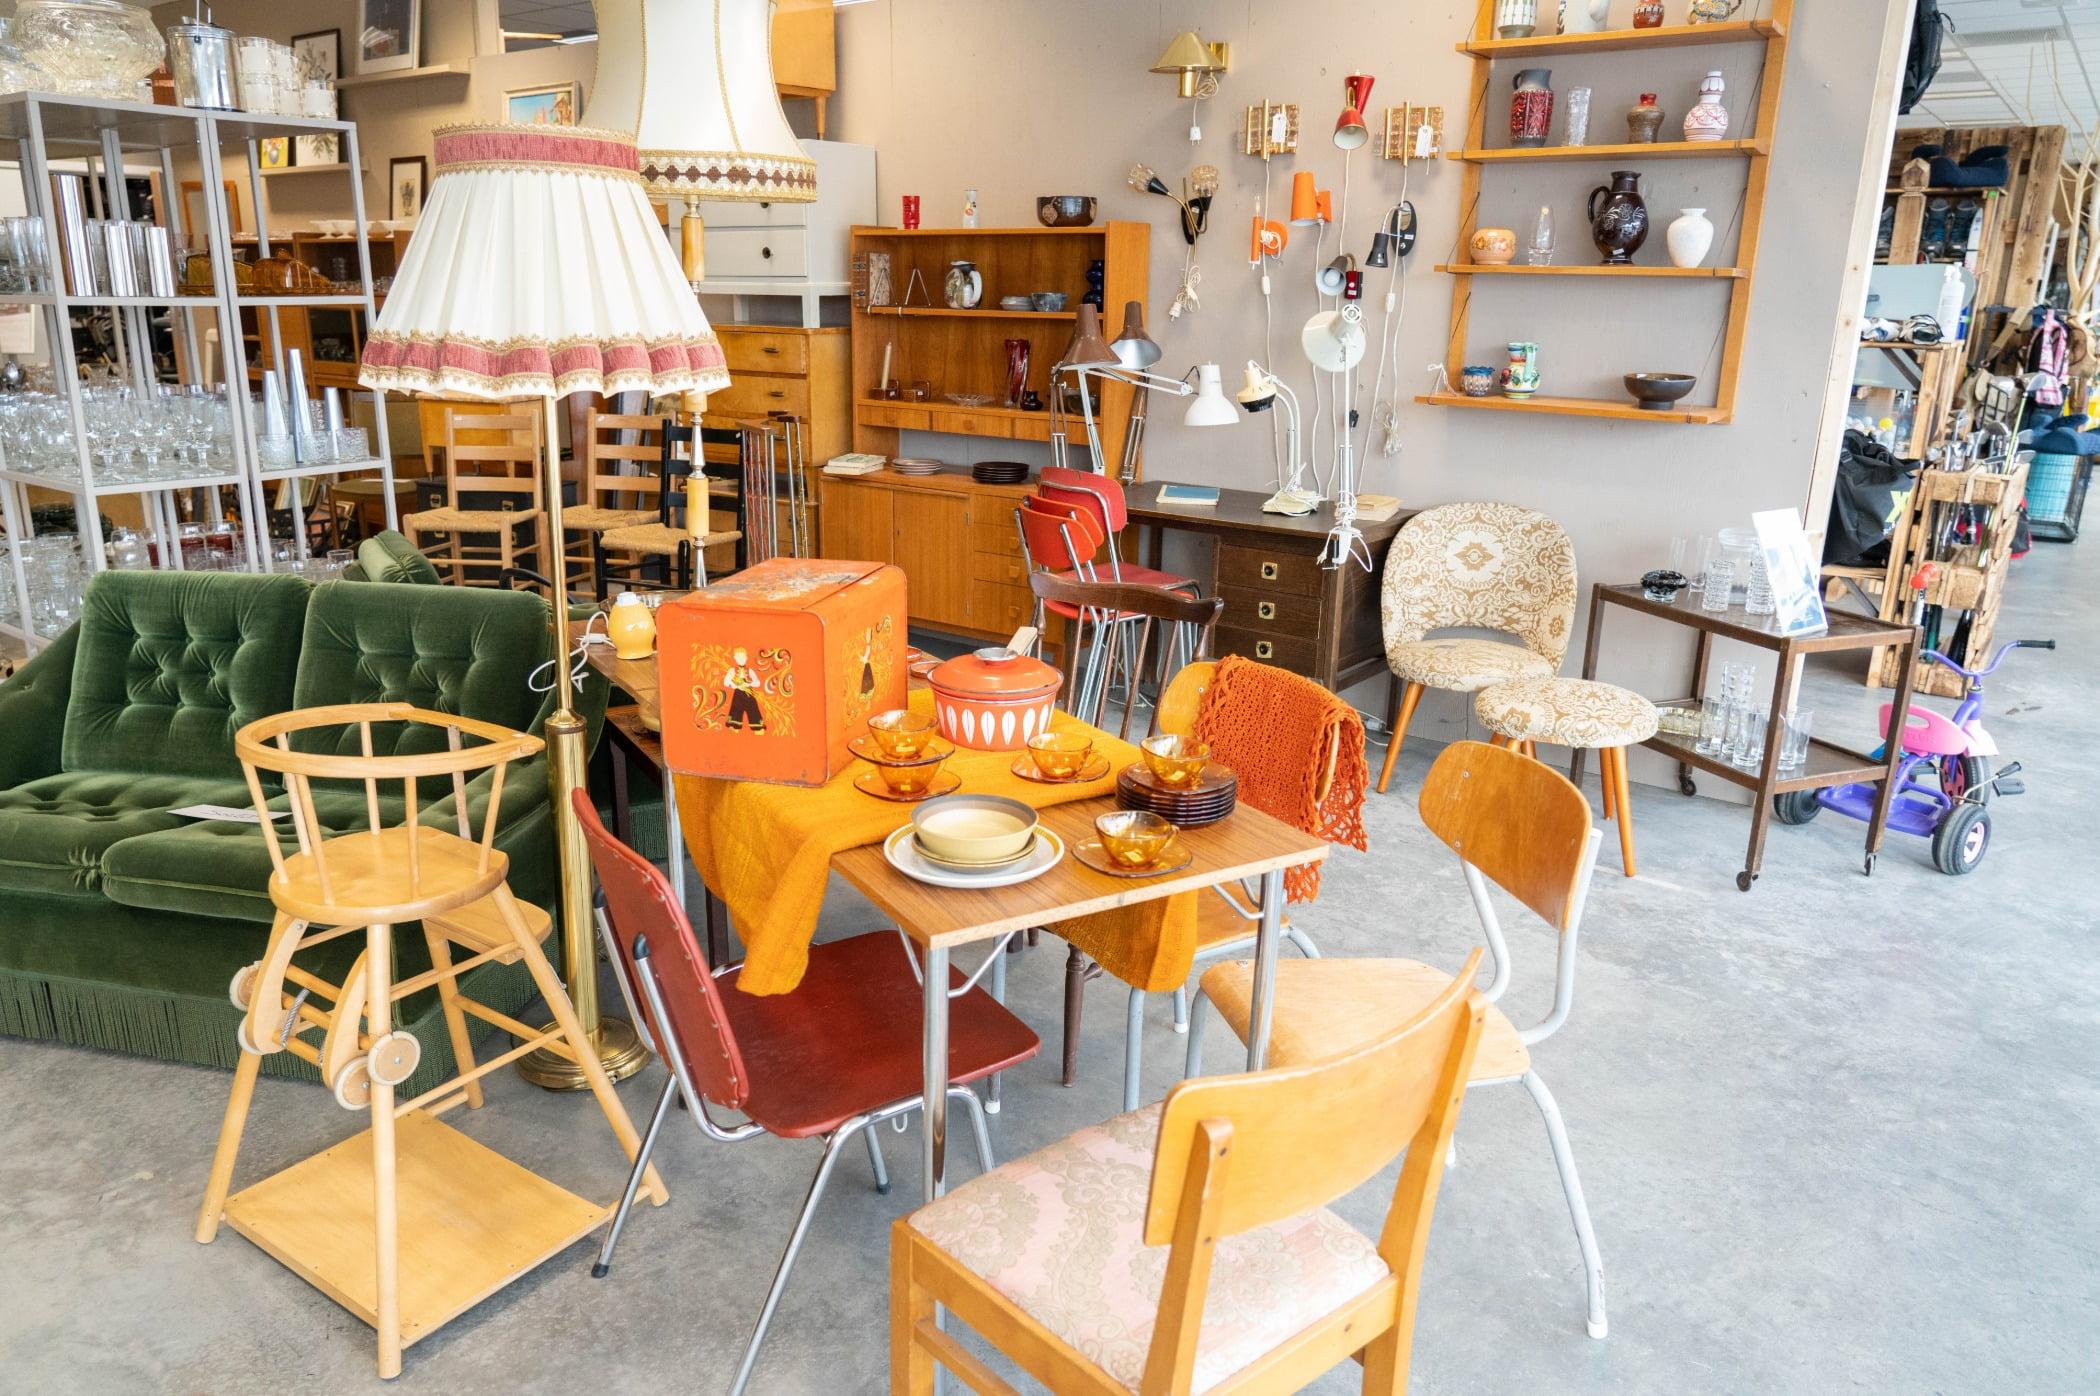 Interior design, Furniture, Table, Chair, Shelf, Bookcase, Orange, Shelving, Floor, Wood